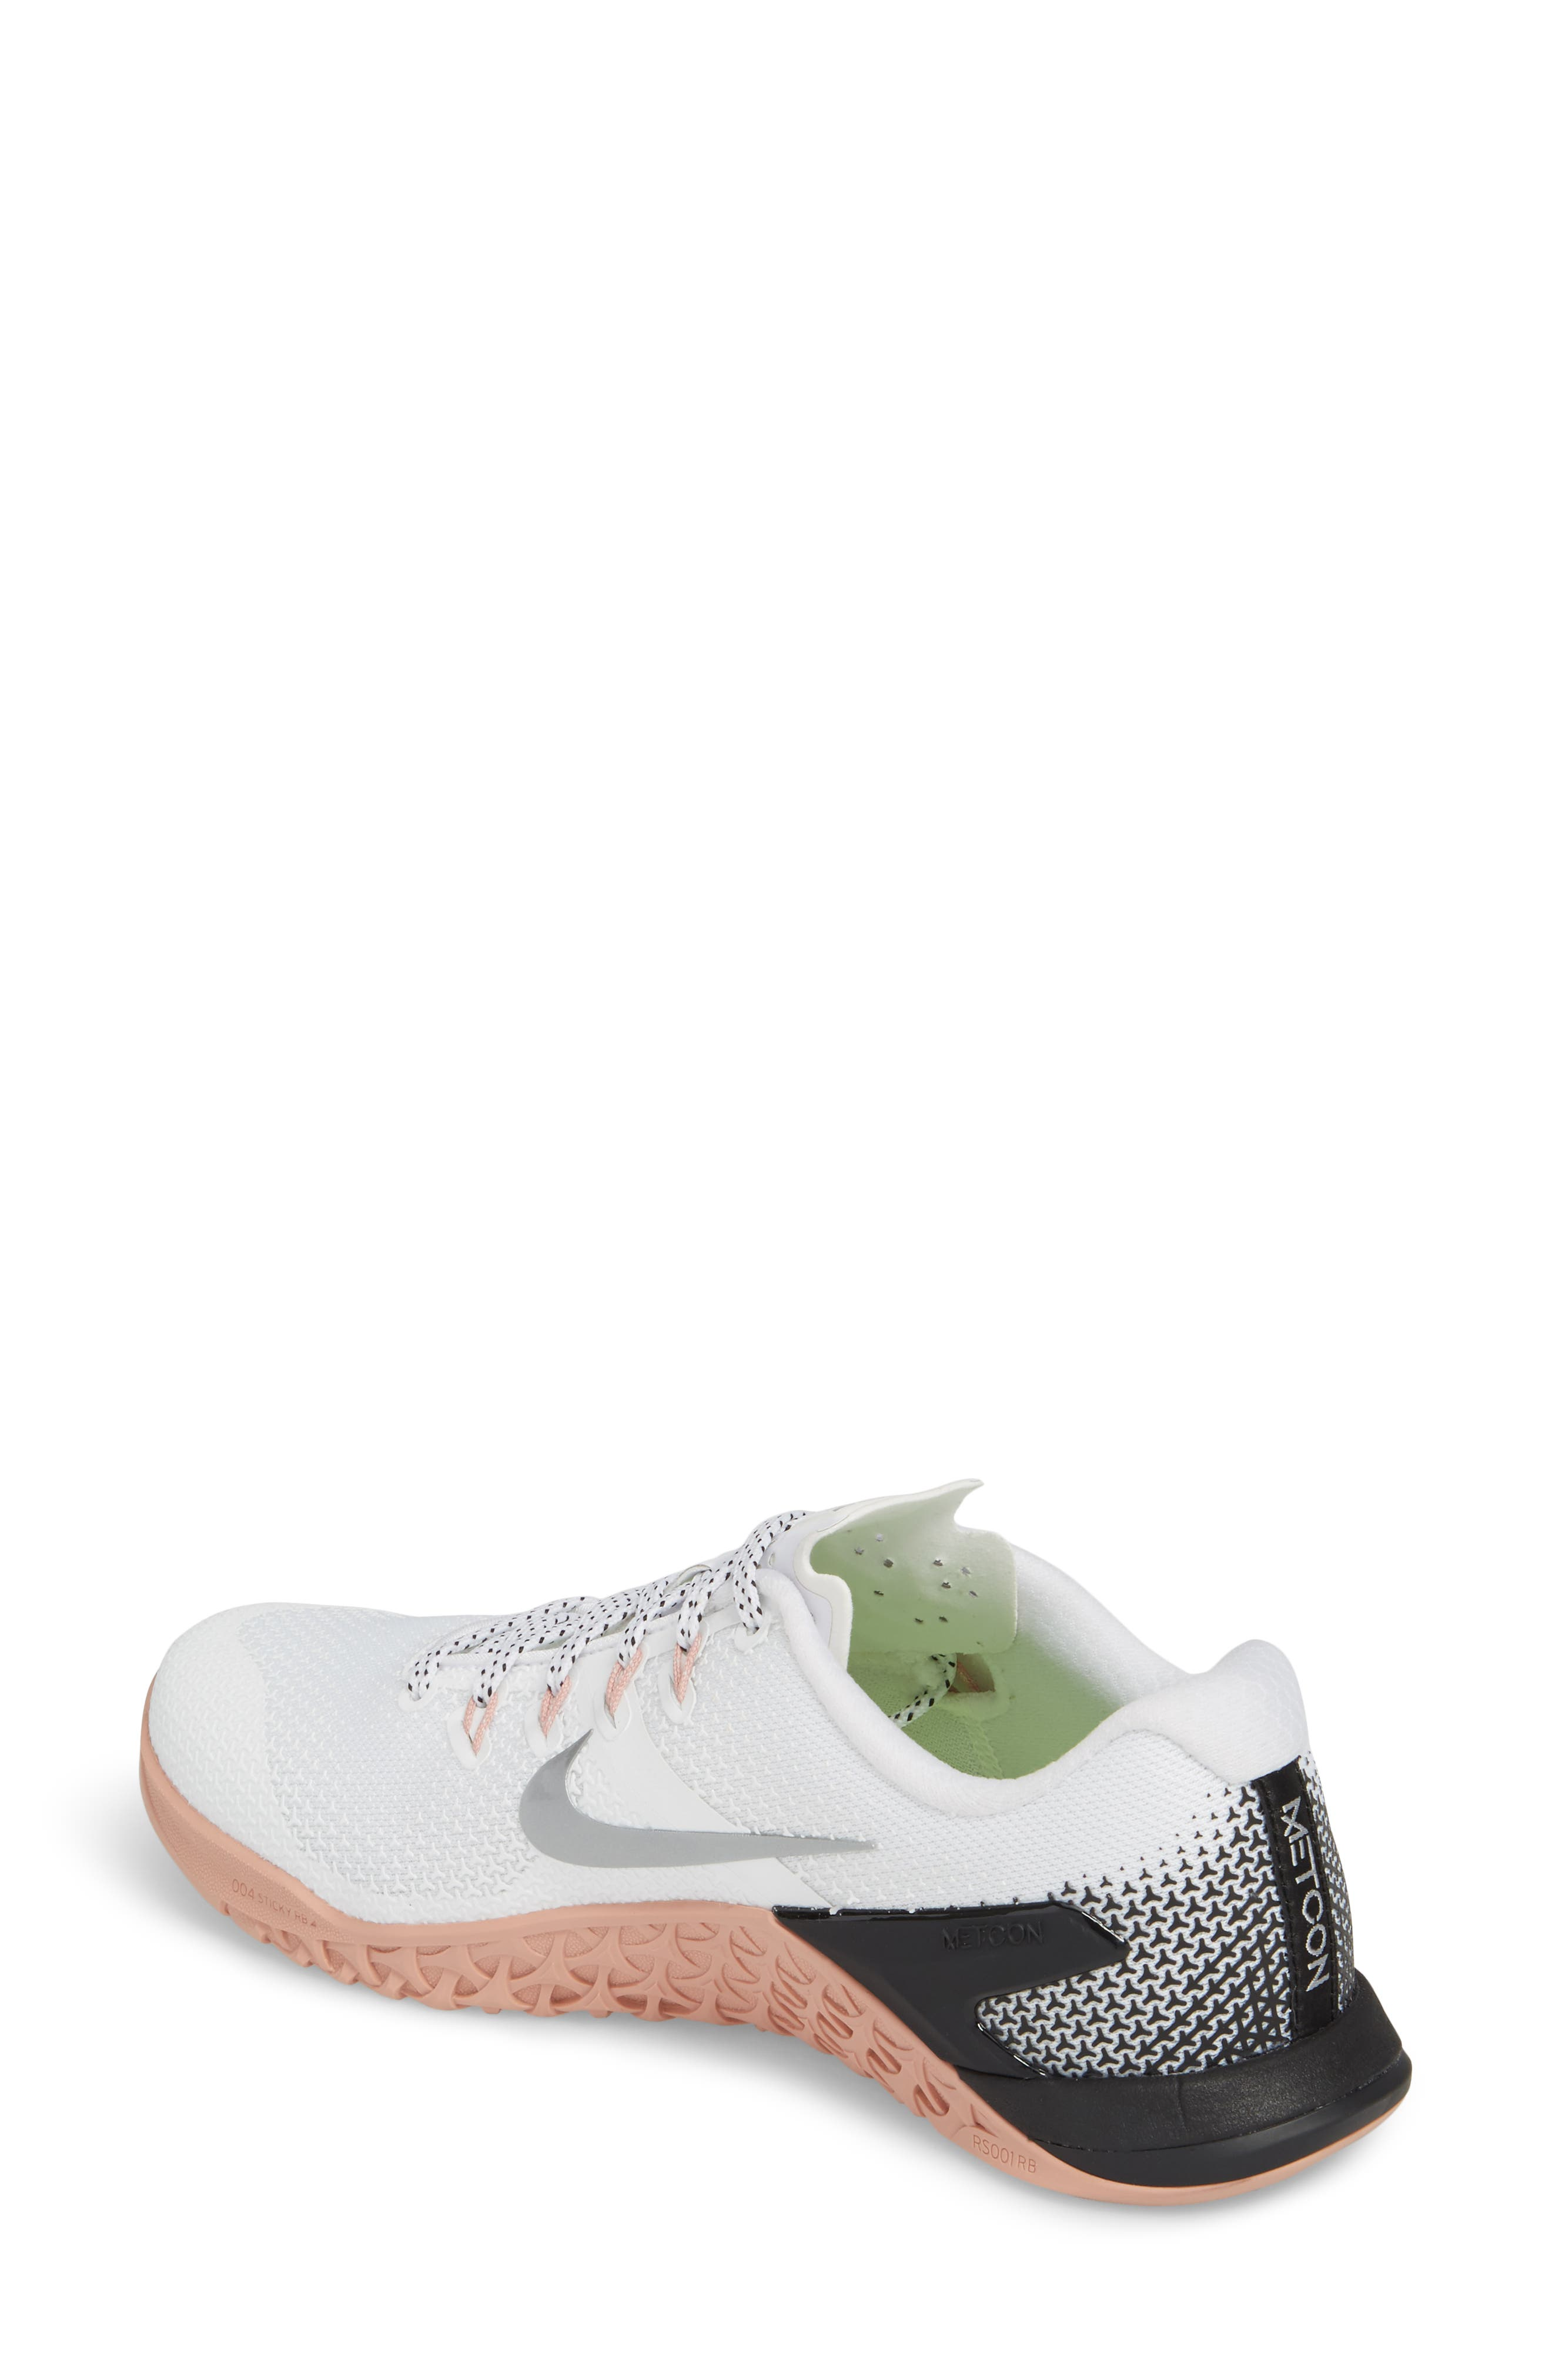 Metcon 4 Training Shoe,                             Alternate thumbnail 12, color,